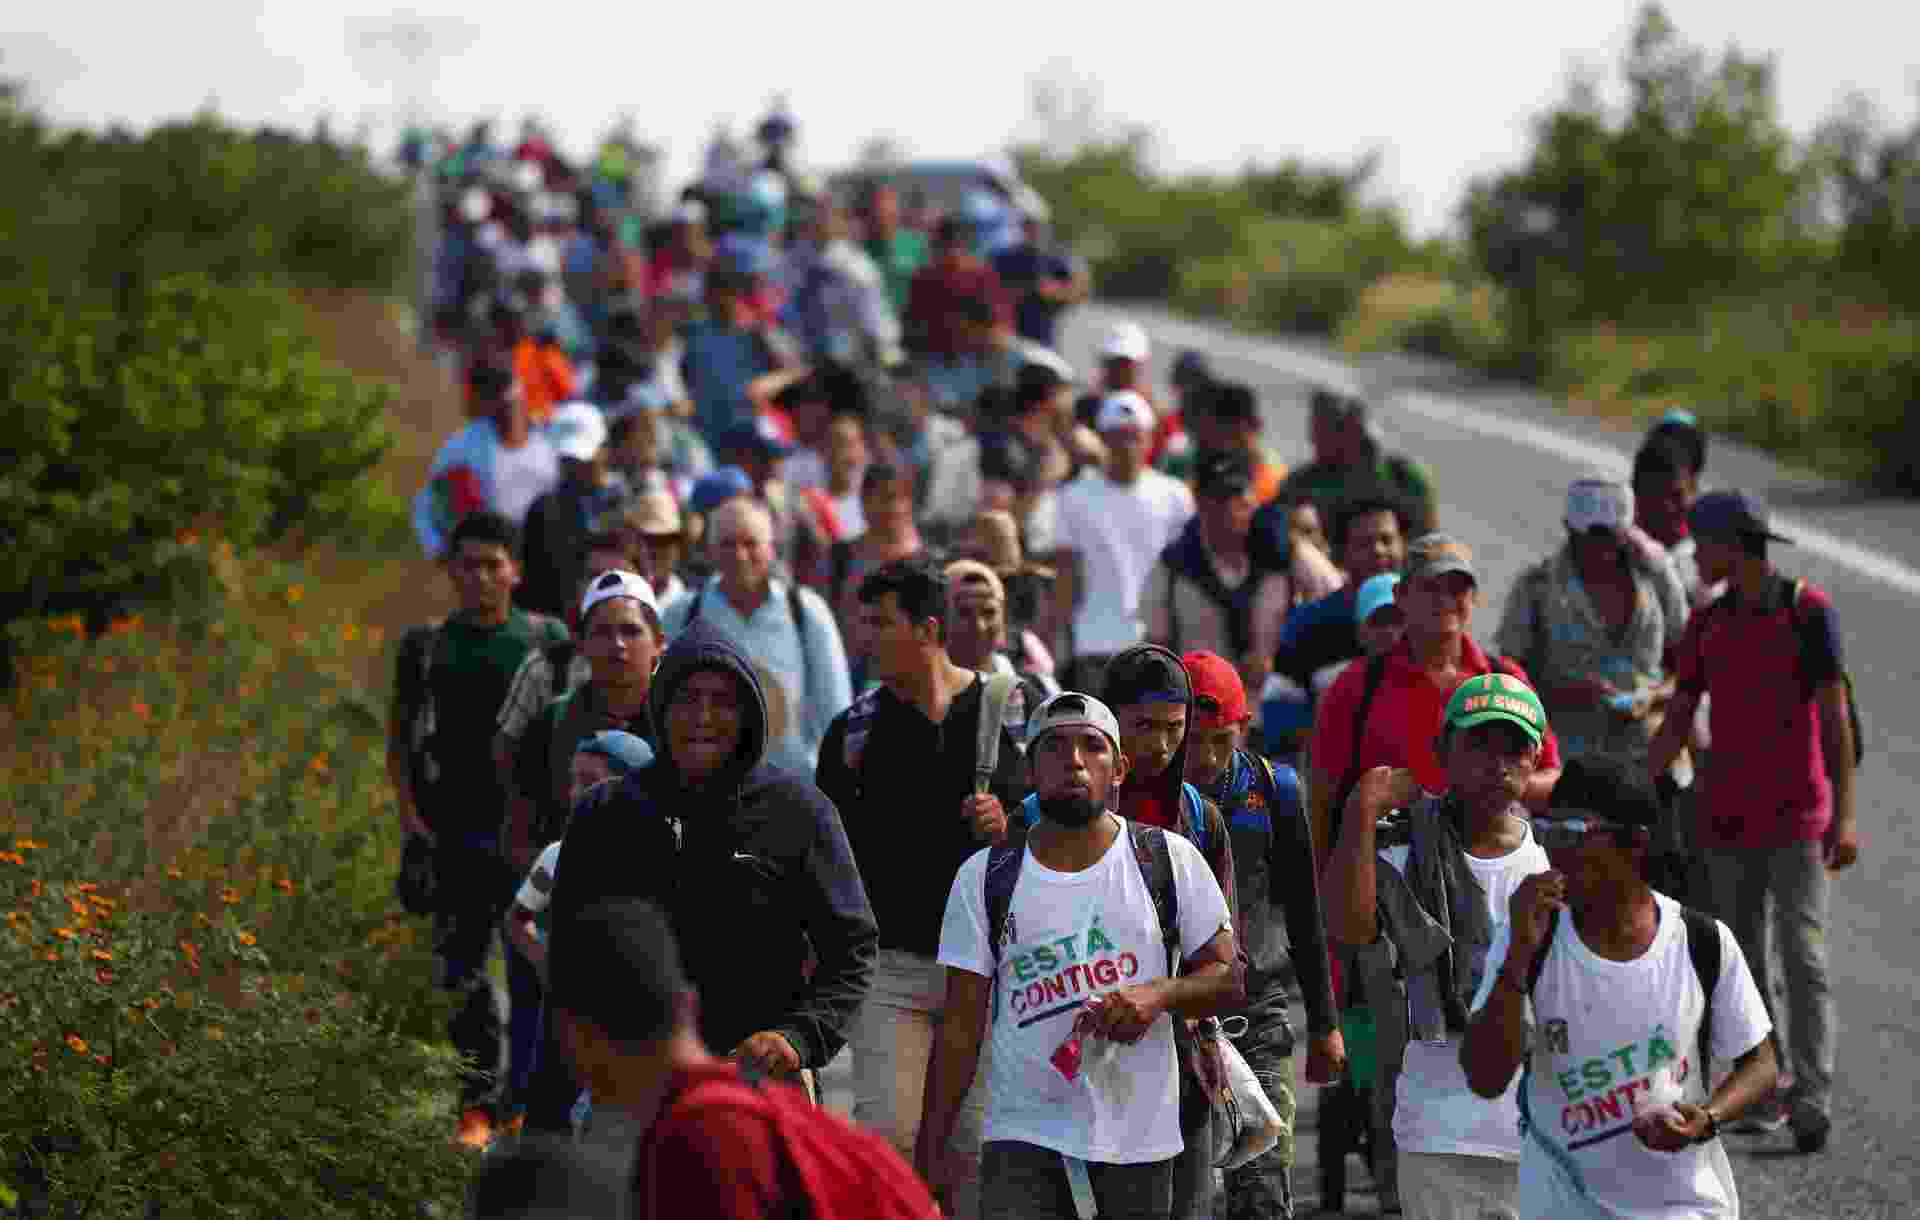 30.out.2018 - Milhares de imigrantes da América Central andam entre Juchitan até Santiago Niltipec, no México, rumo aos Estados Unidos - REUTERS/Hannah McKay